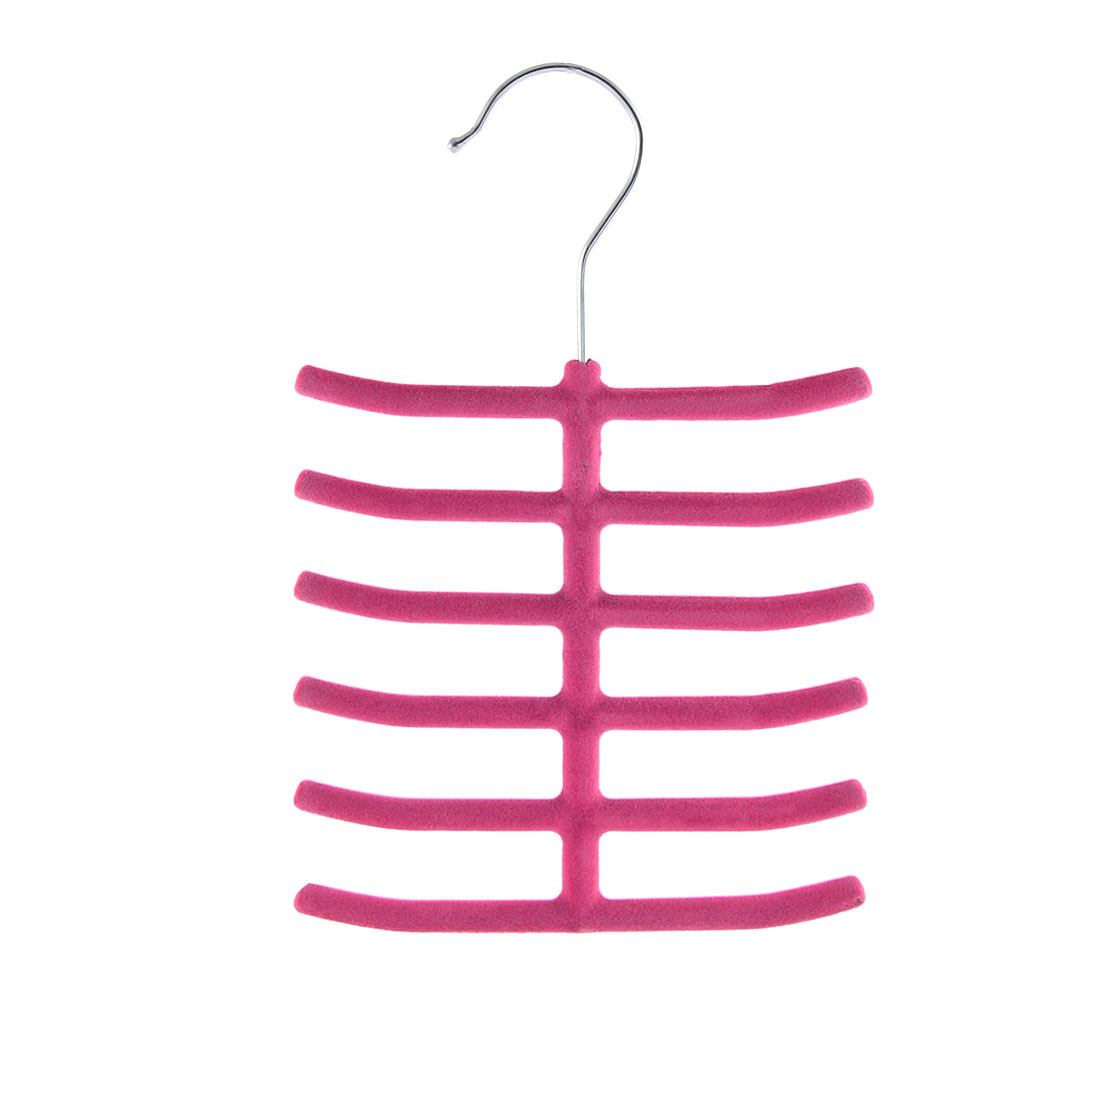 Household Bedroom Fishbone Shaped Towel Belt Shawl Scarf Necktie Rack Holder Fuchsia